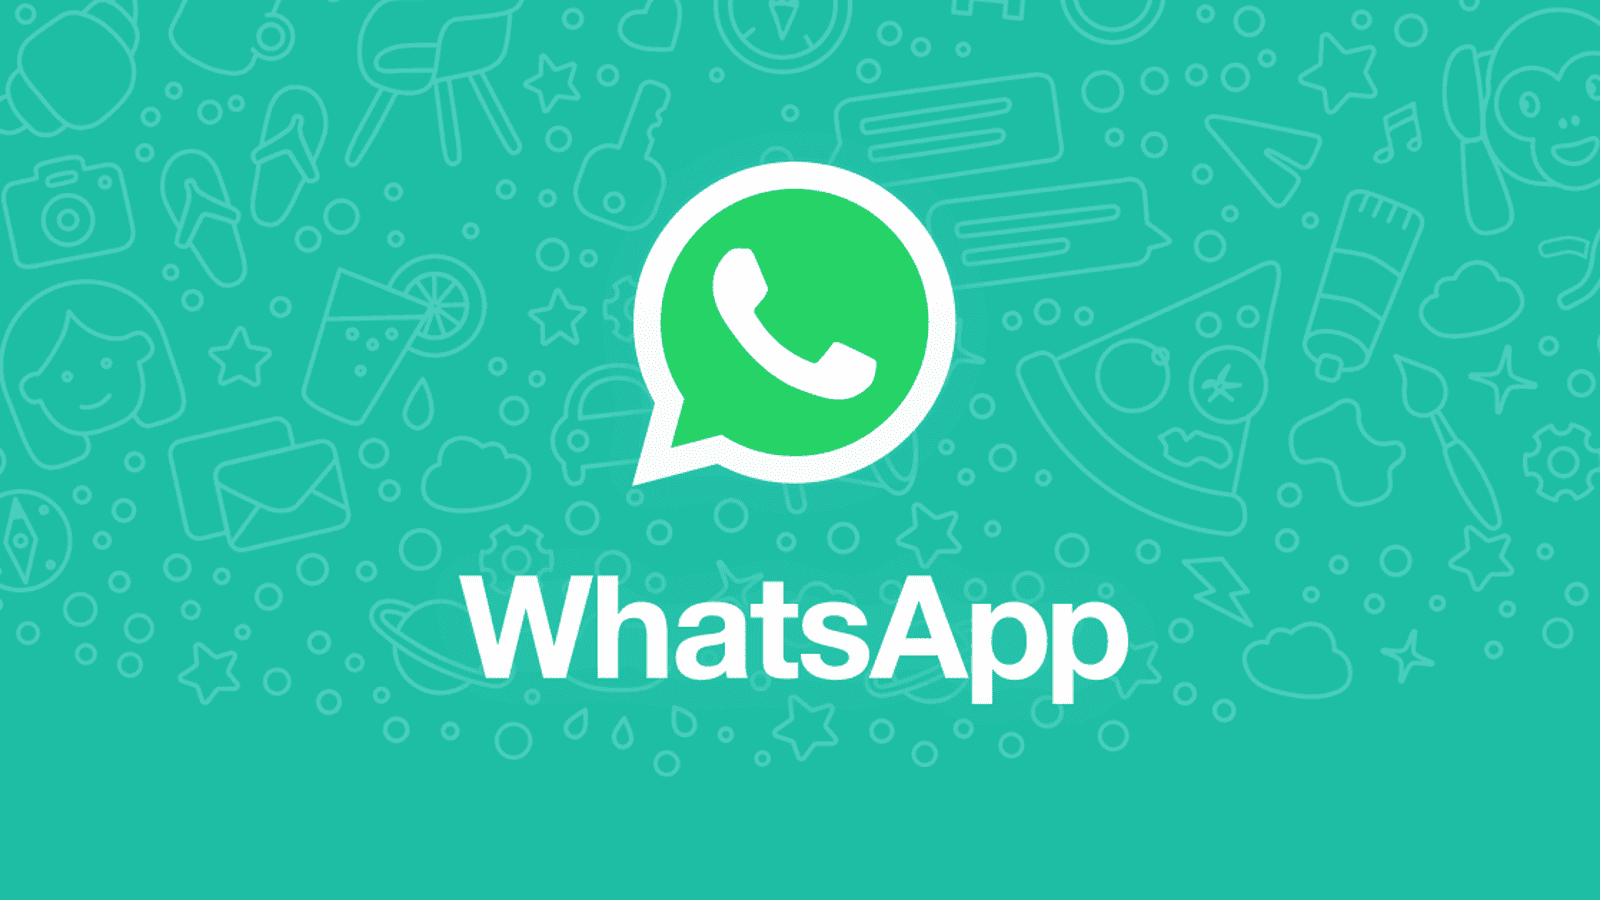 QnA VBage The Best WhatsApp Alternatives